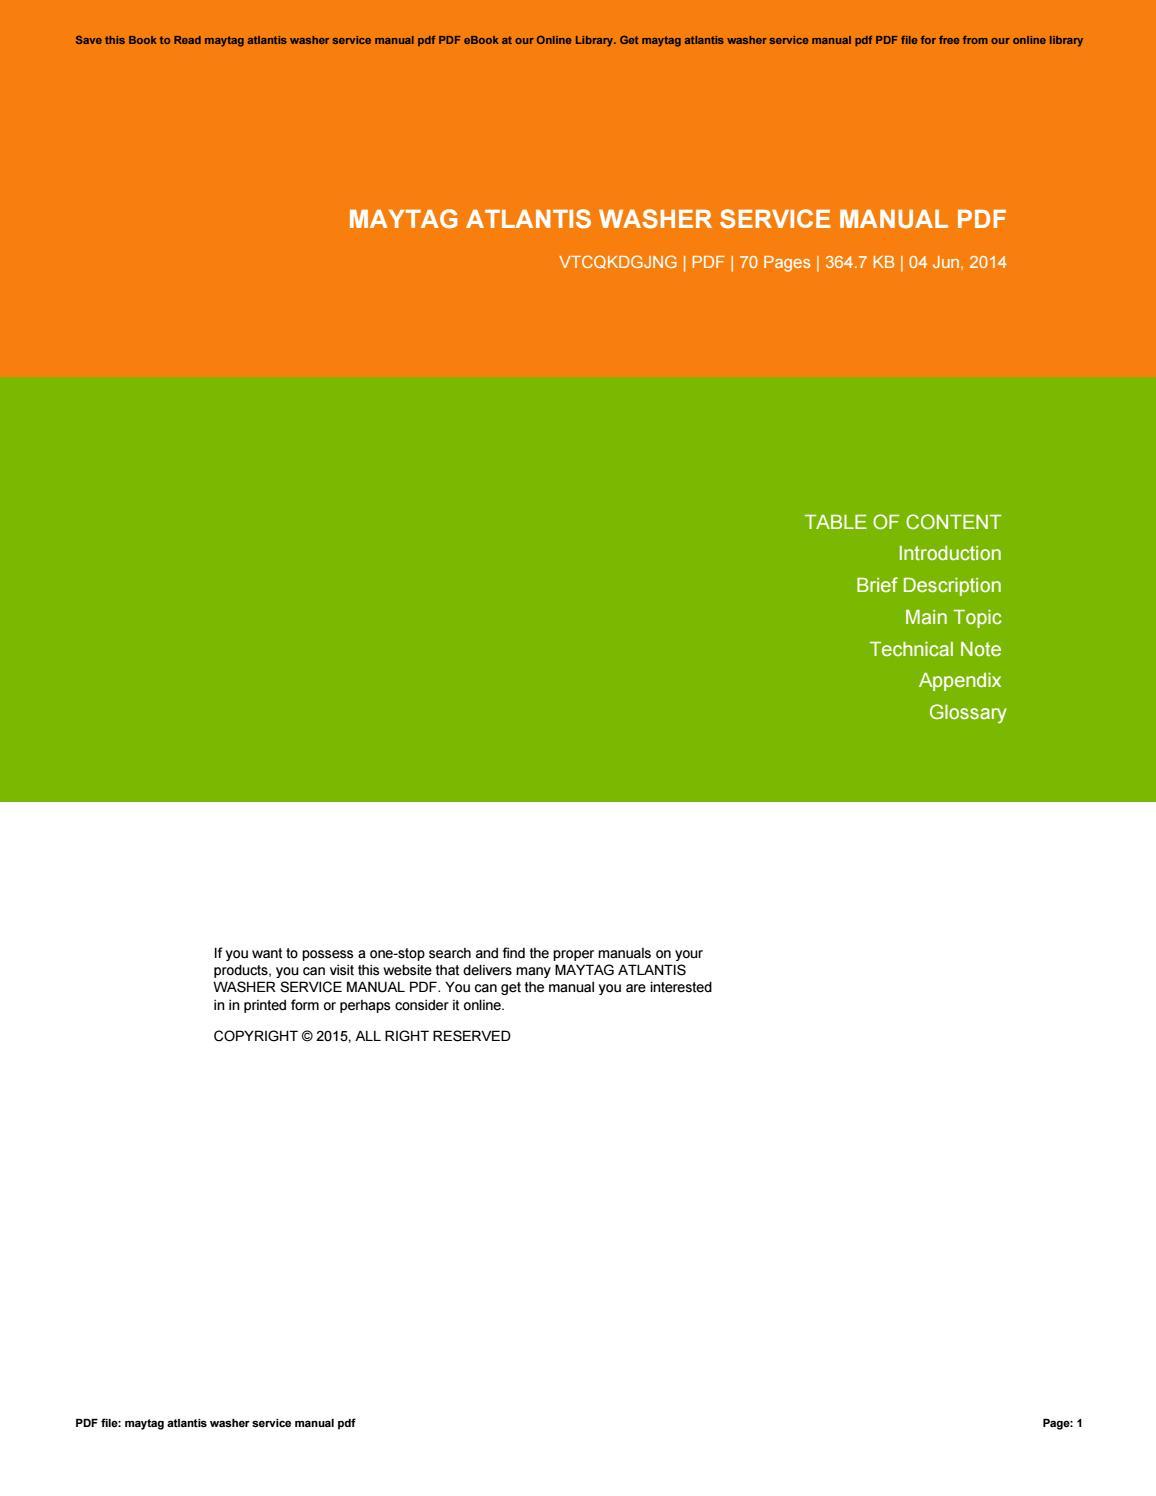 maytag atlantis washer service manual pdf by larry issuu rh issuu com Ortho Rotary Spreader Settings Ortho Whirlybird Hand Spreader